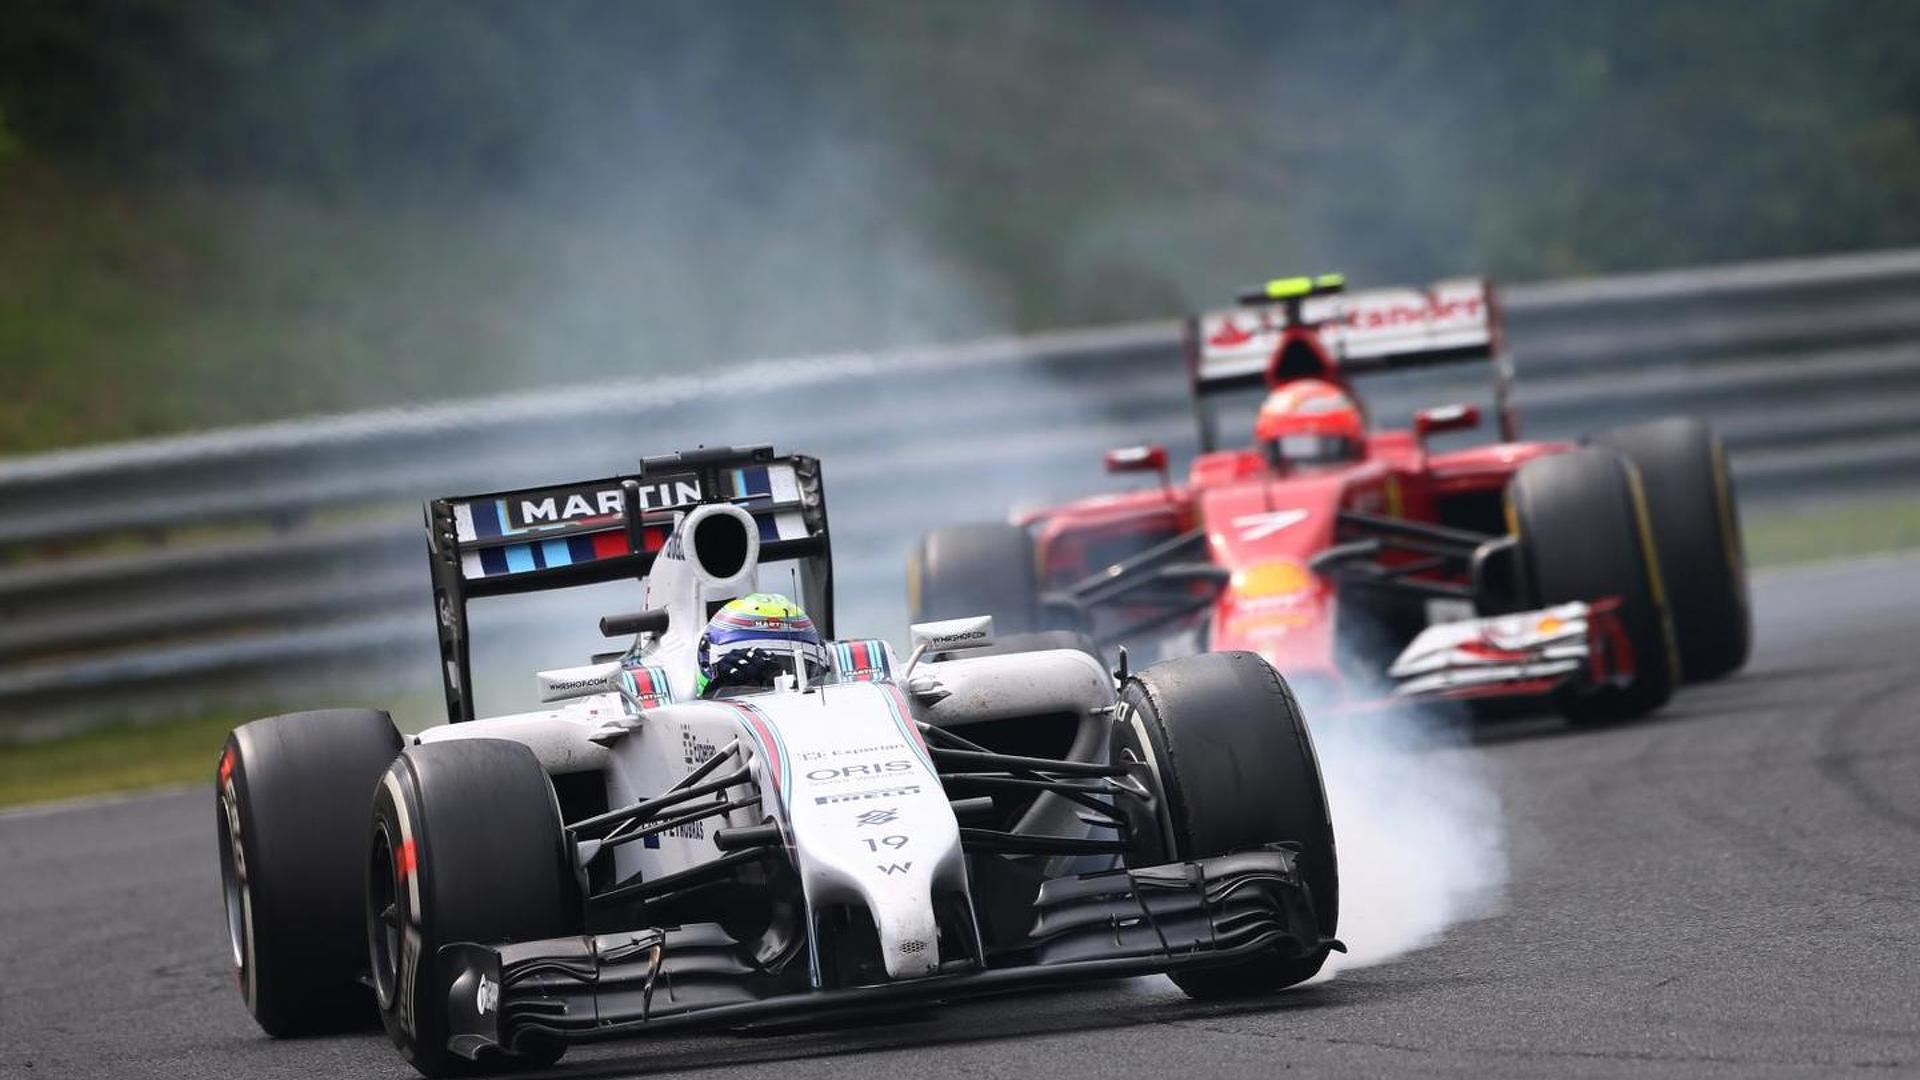 Massa wants Williams to beat old team Ferrari